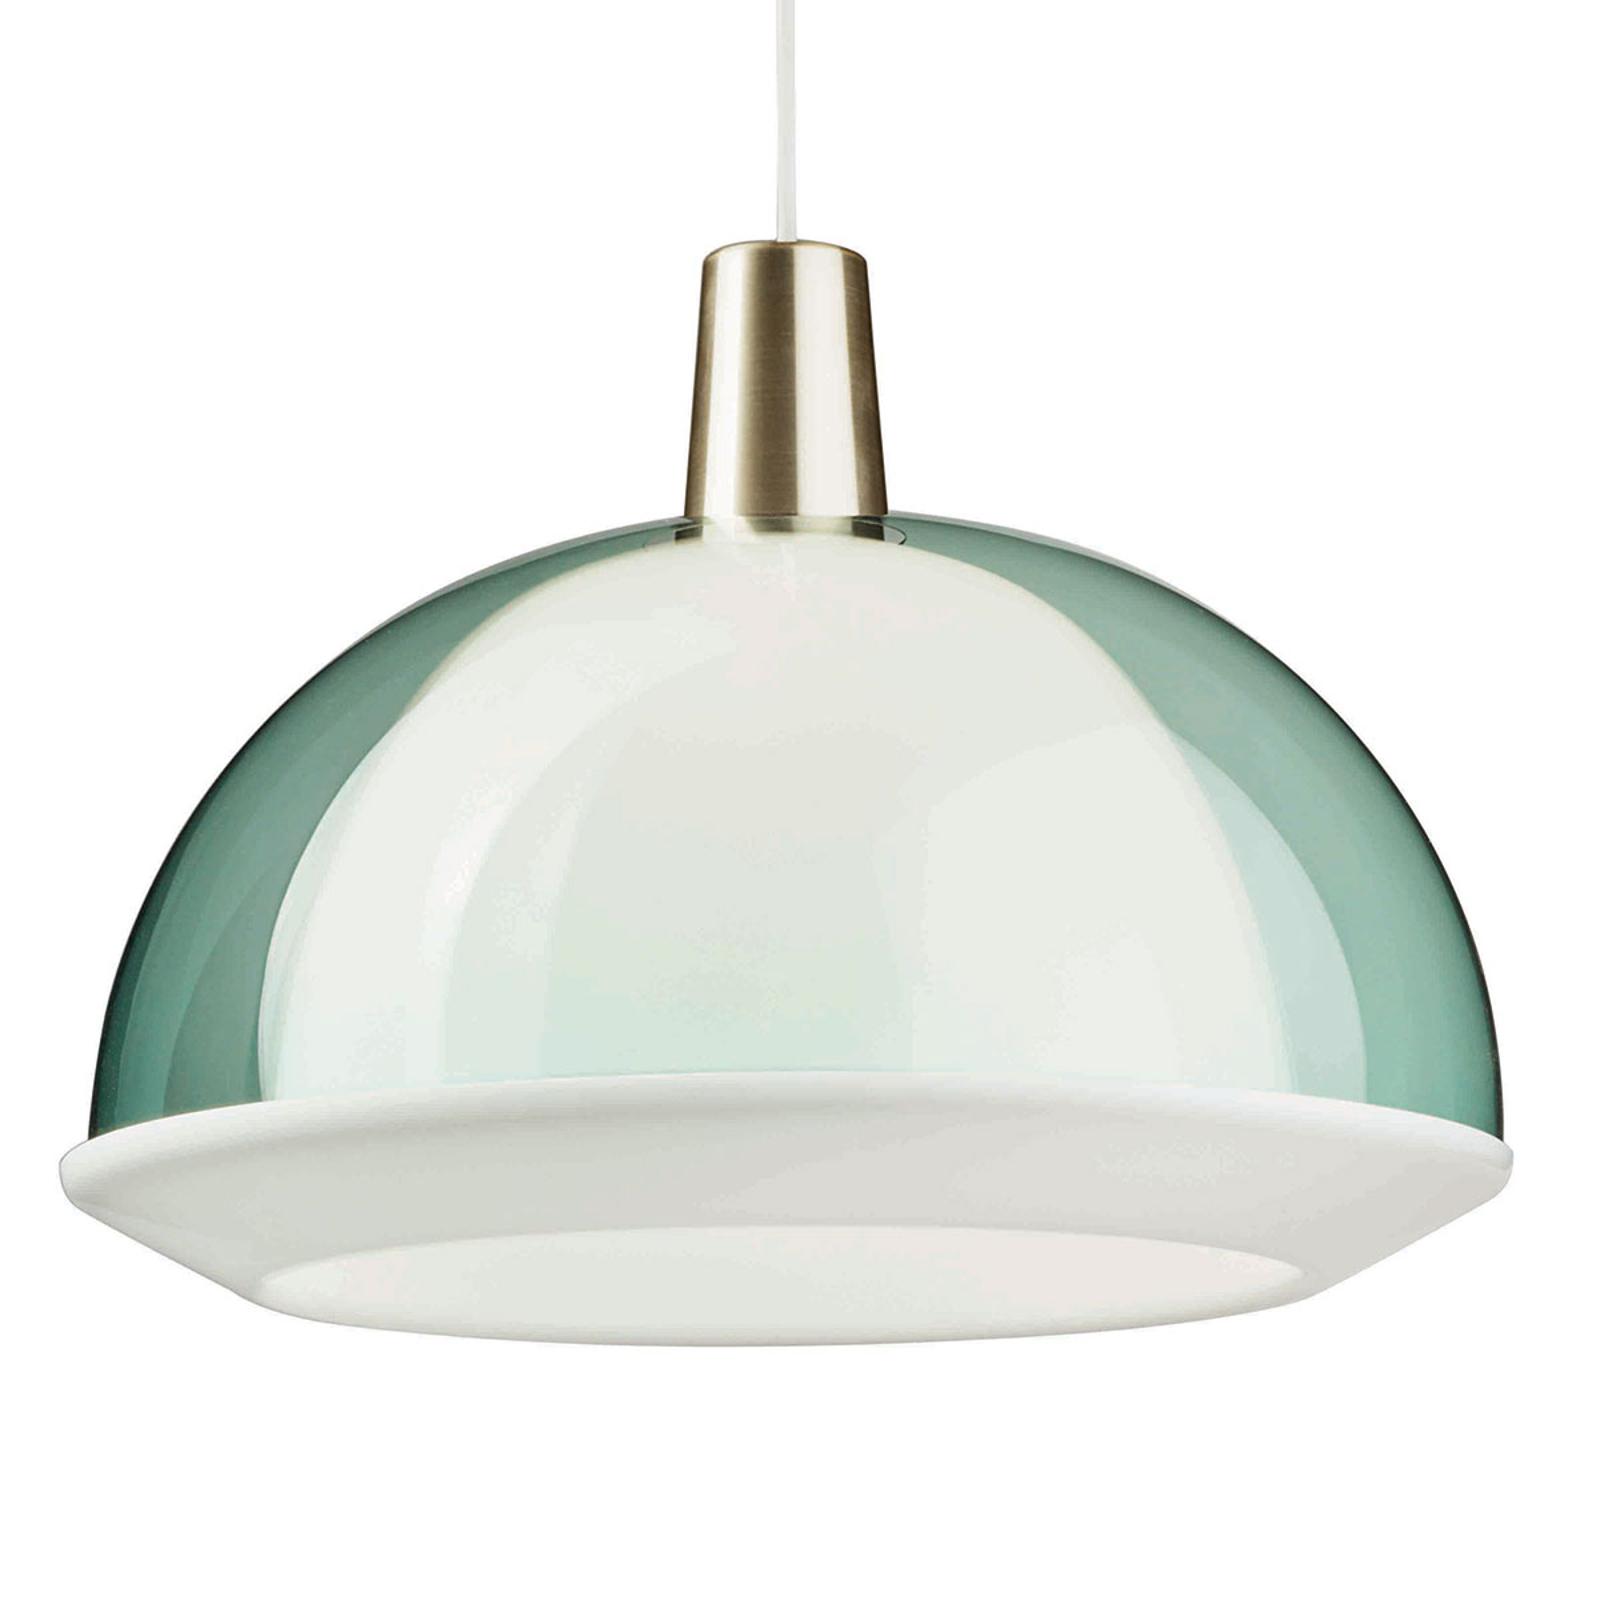 Innolux Kuplat 400 hanglamp 40 cm turquoise